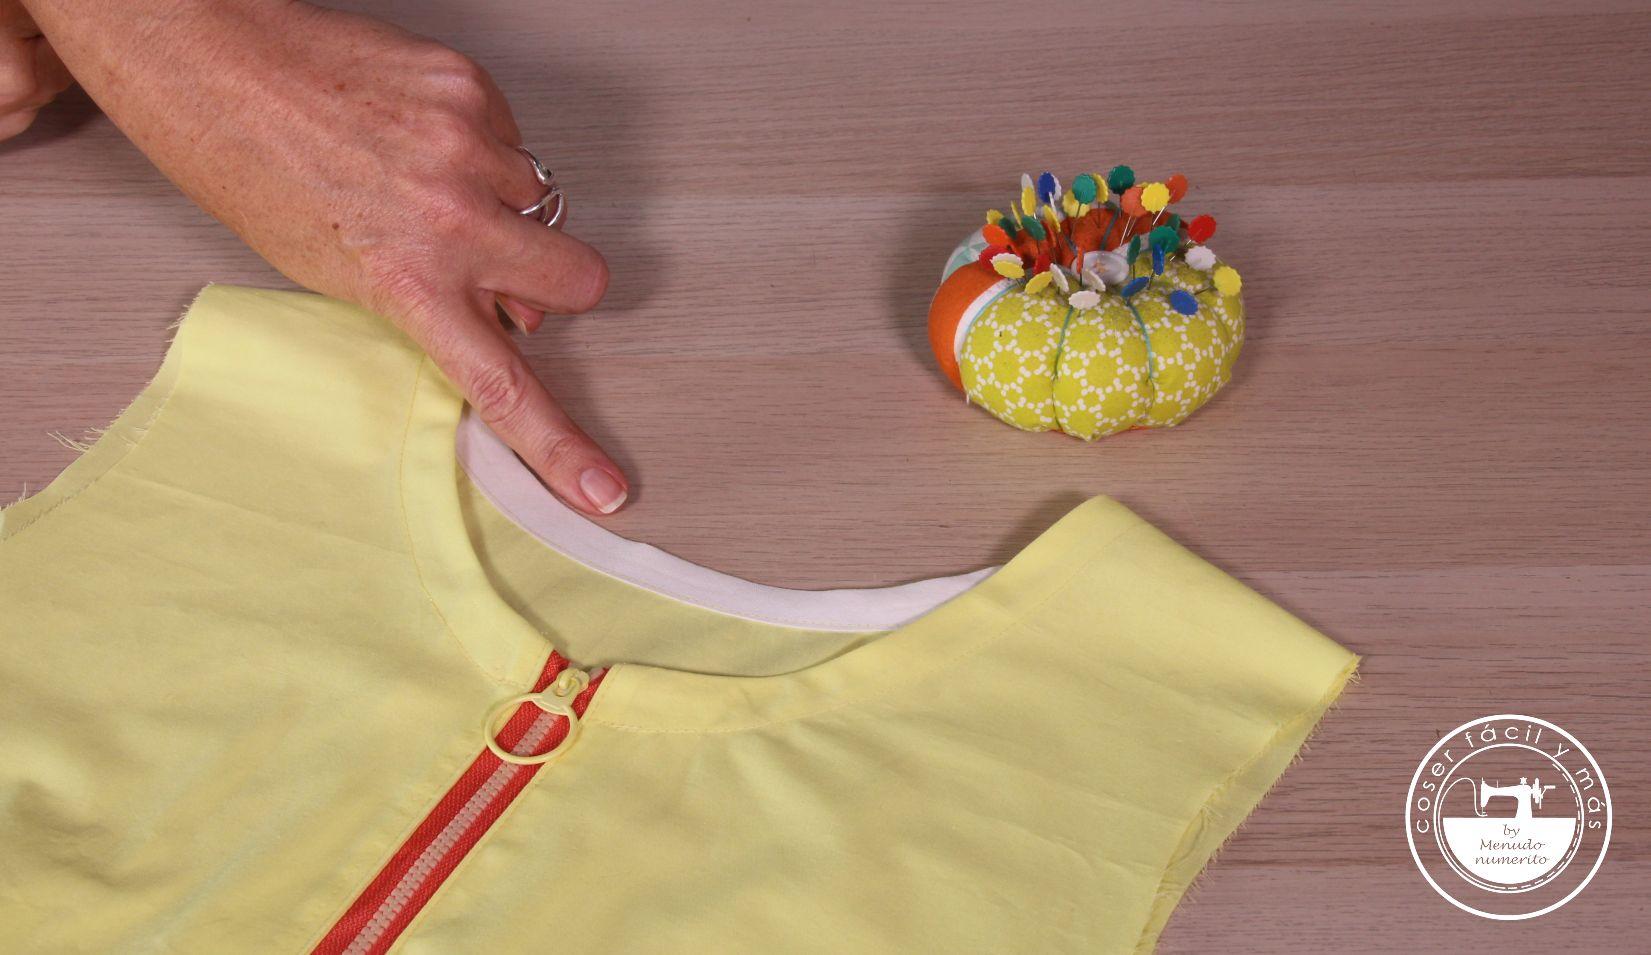 rematar escote con bies o sesgo coser facil menudo numerito blogs de costura